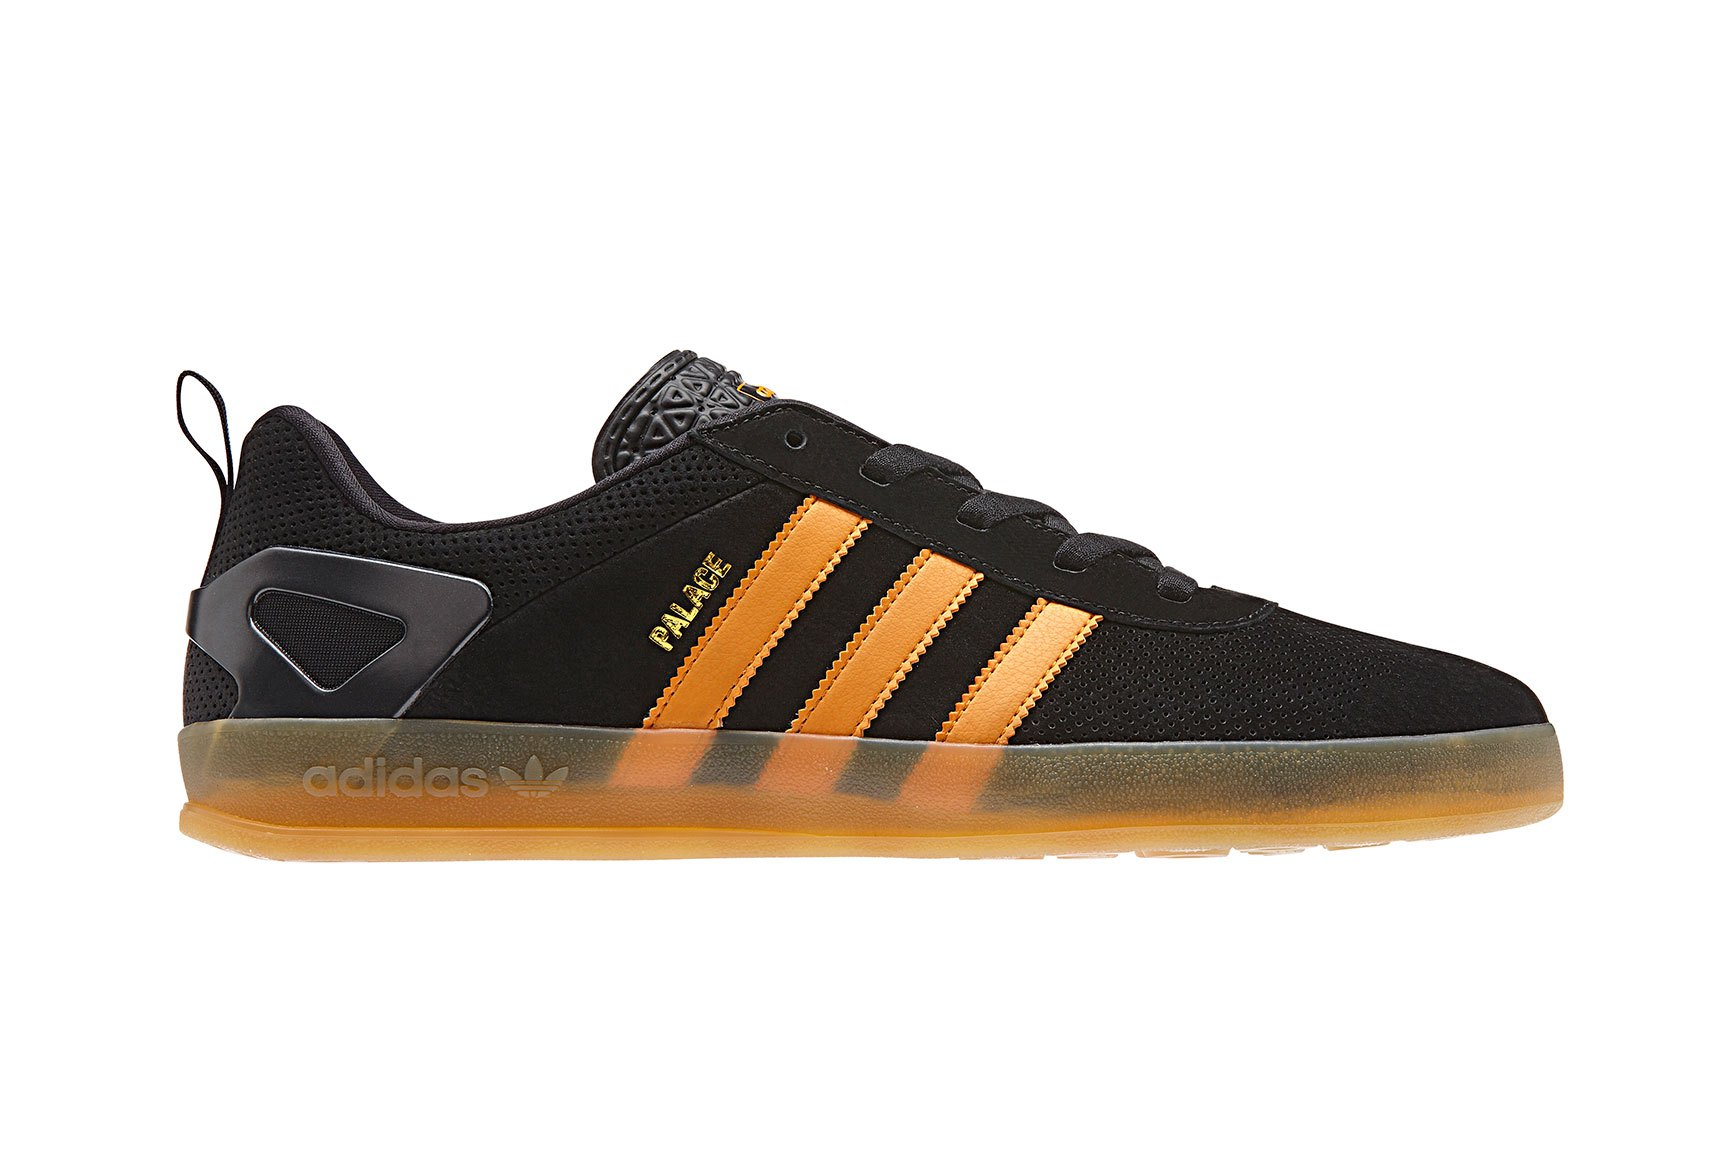 palace-adidas-originals-footwear-palace-pro-2